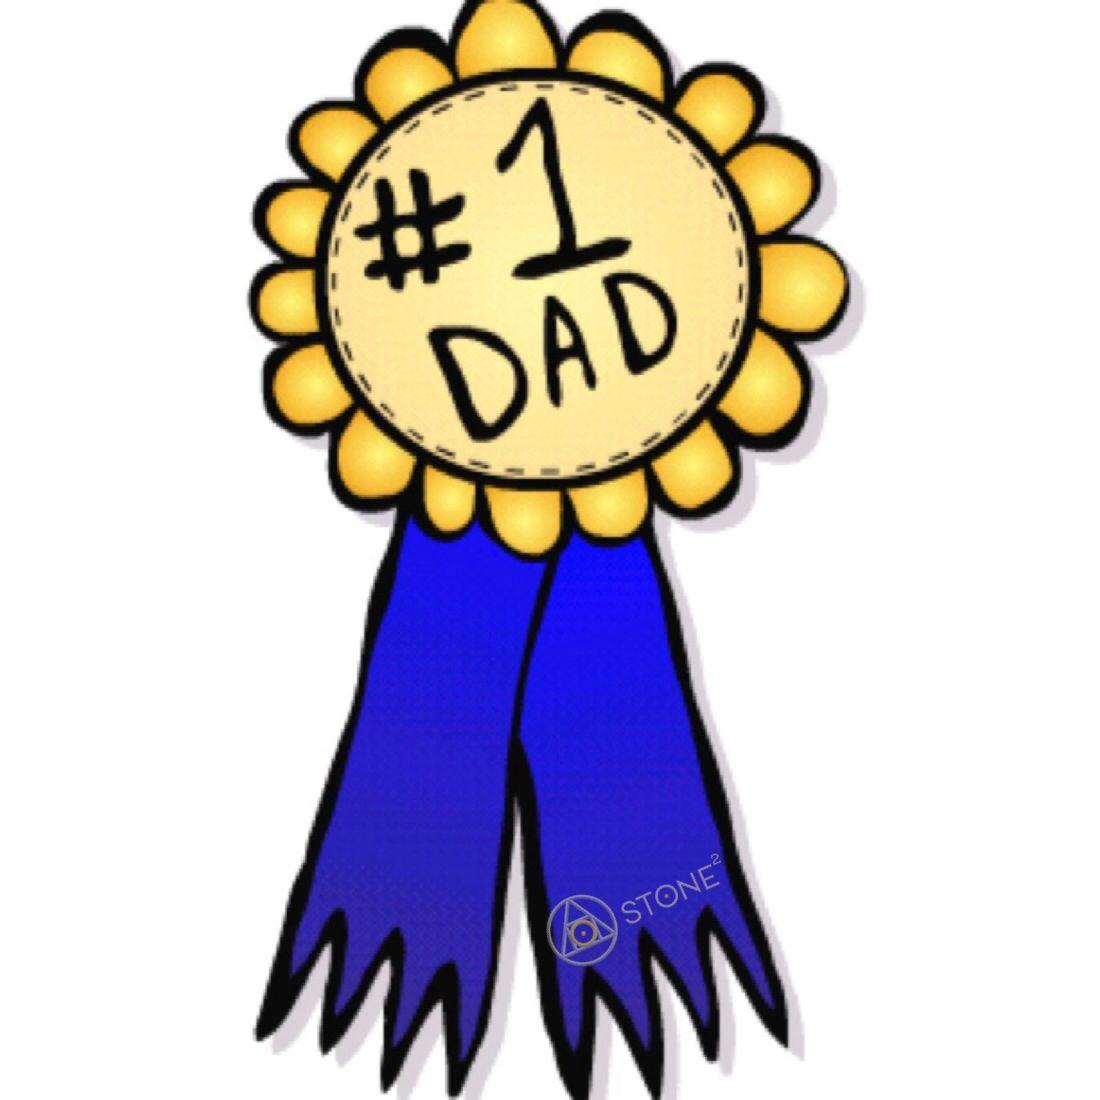 1Dad Ribbon #HappyFathersDay #Holiday #StoneSquared.